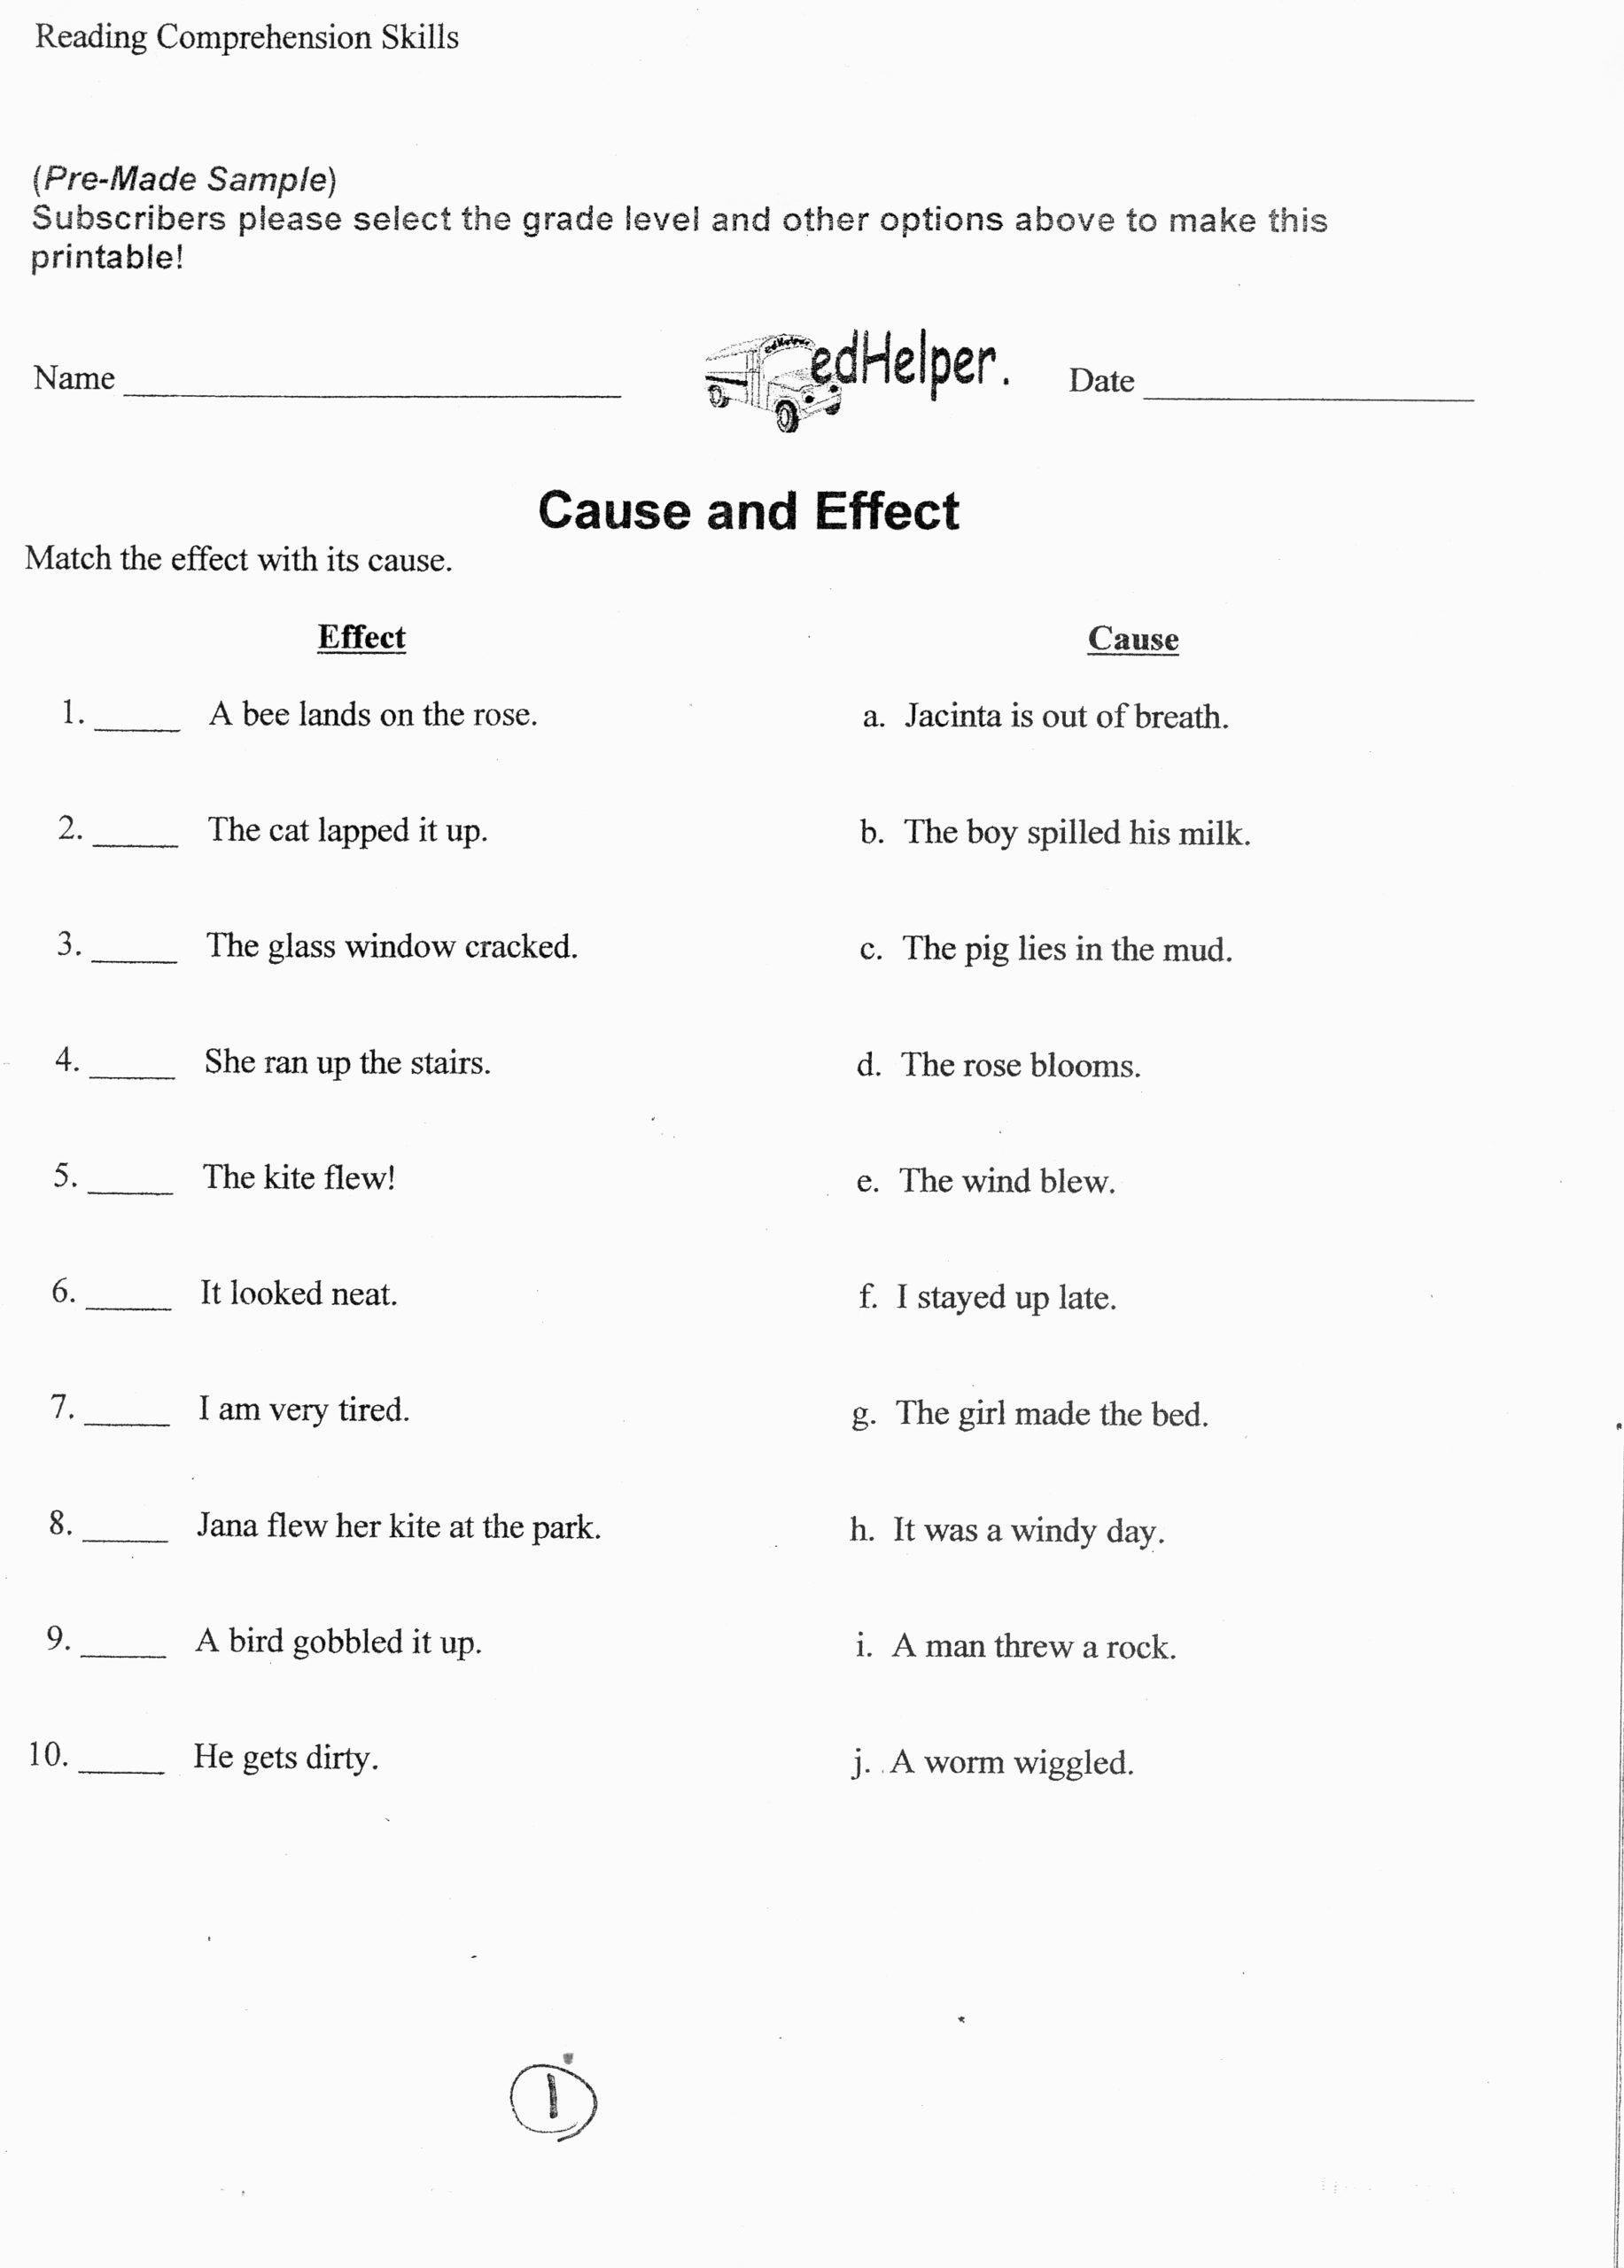 7th Grade Language Arts Worksheets In 2020 6th Grade Writing Language Arts Worksheets Figurative Language Worksheet